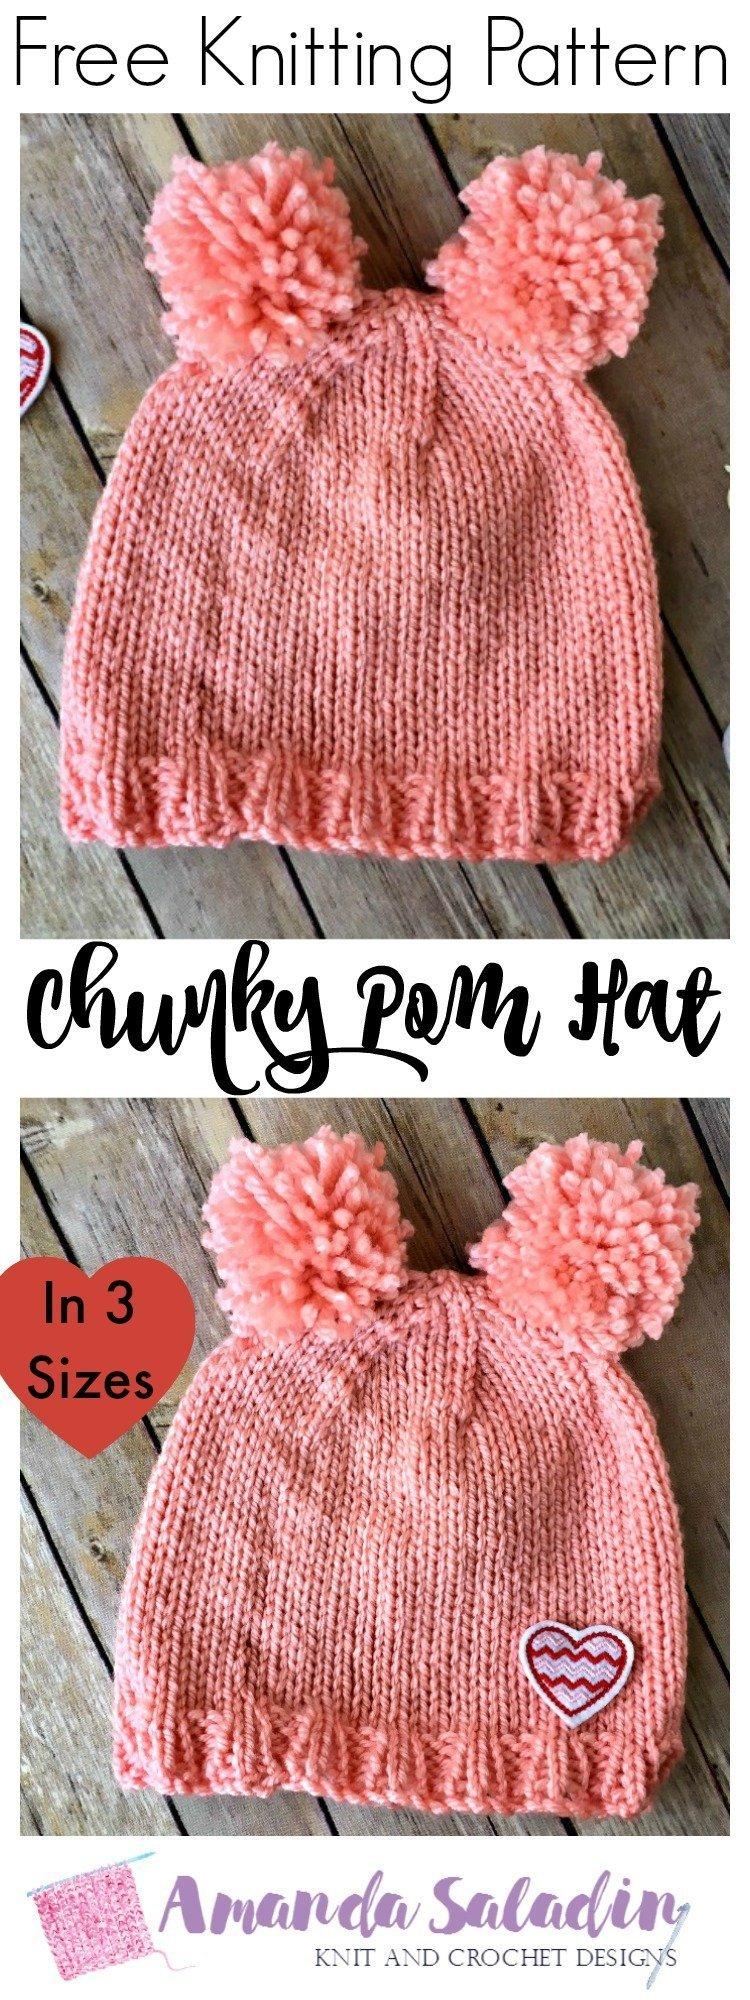 Free Knitting Pattern - Chunky Pom Hat